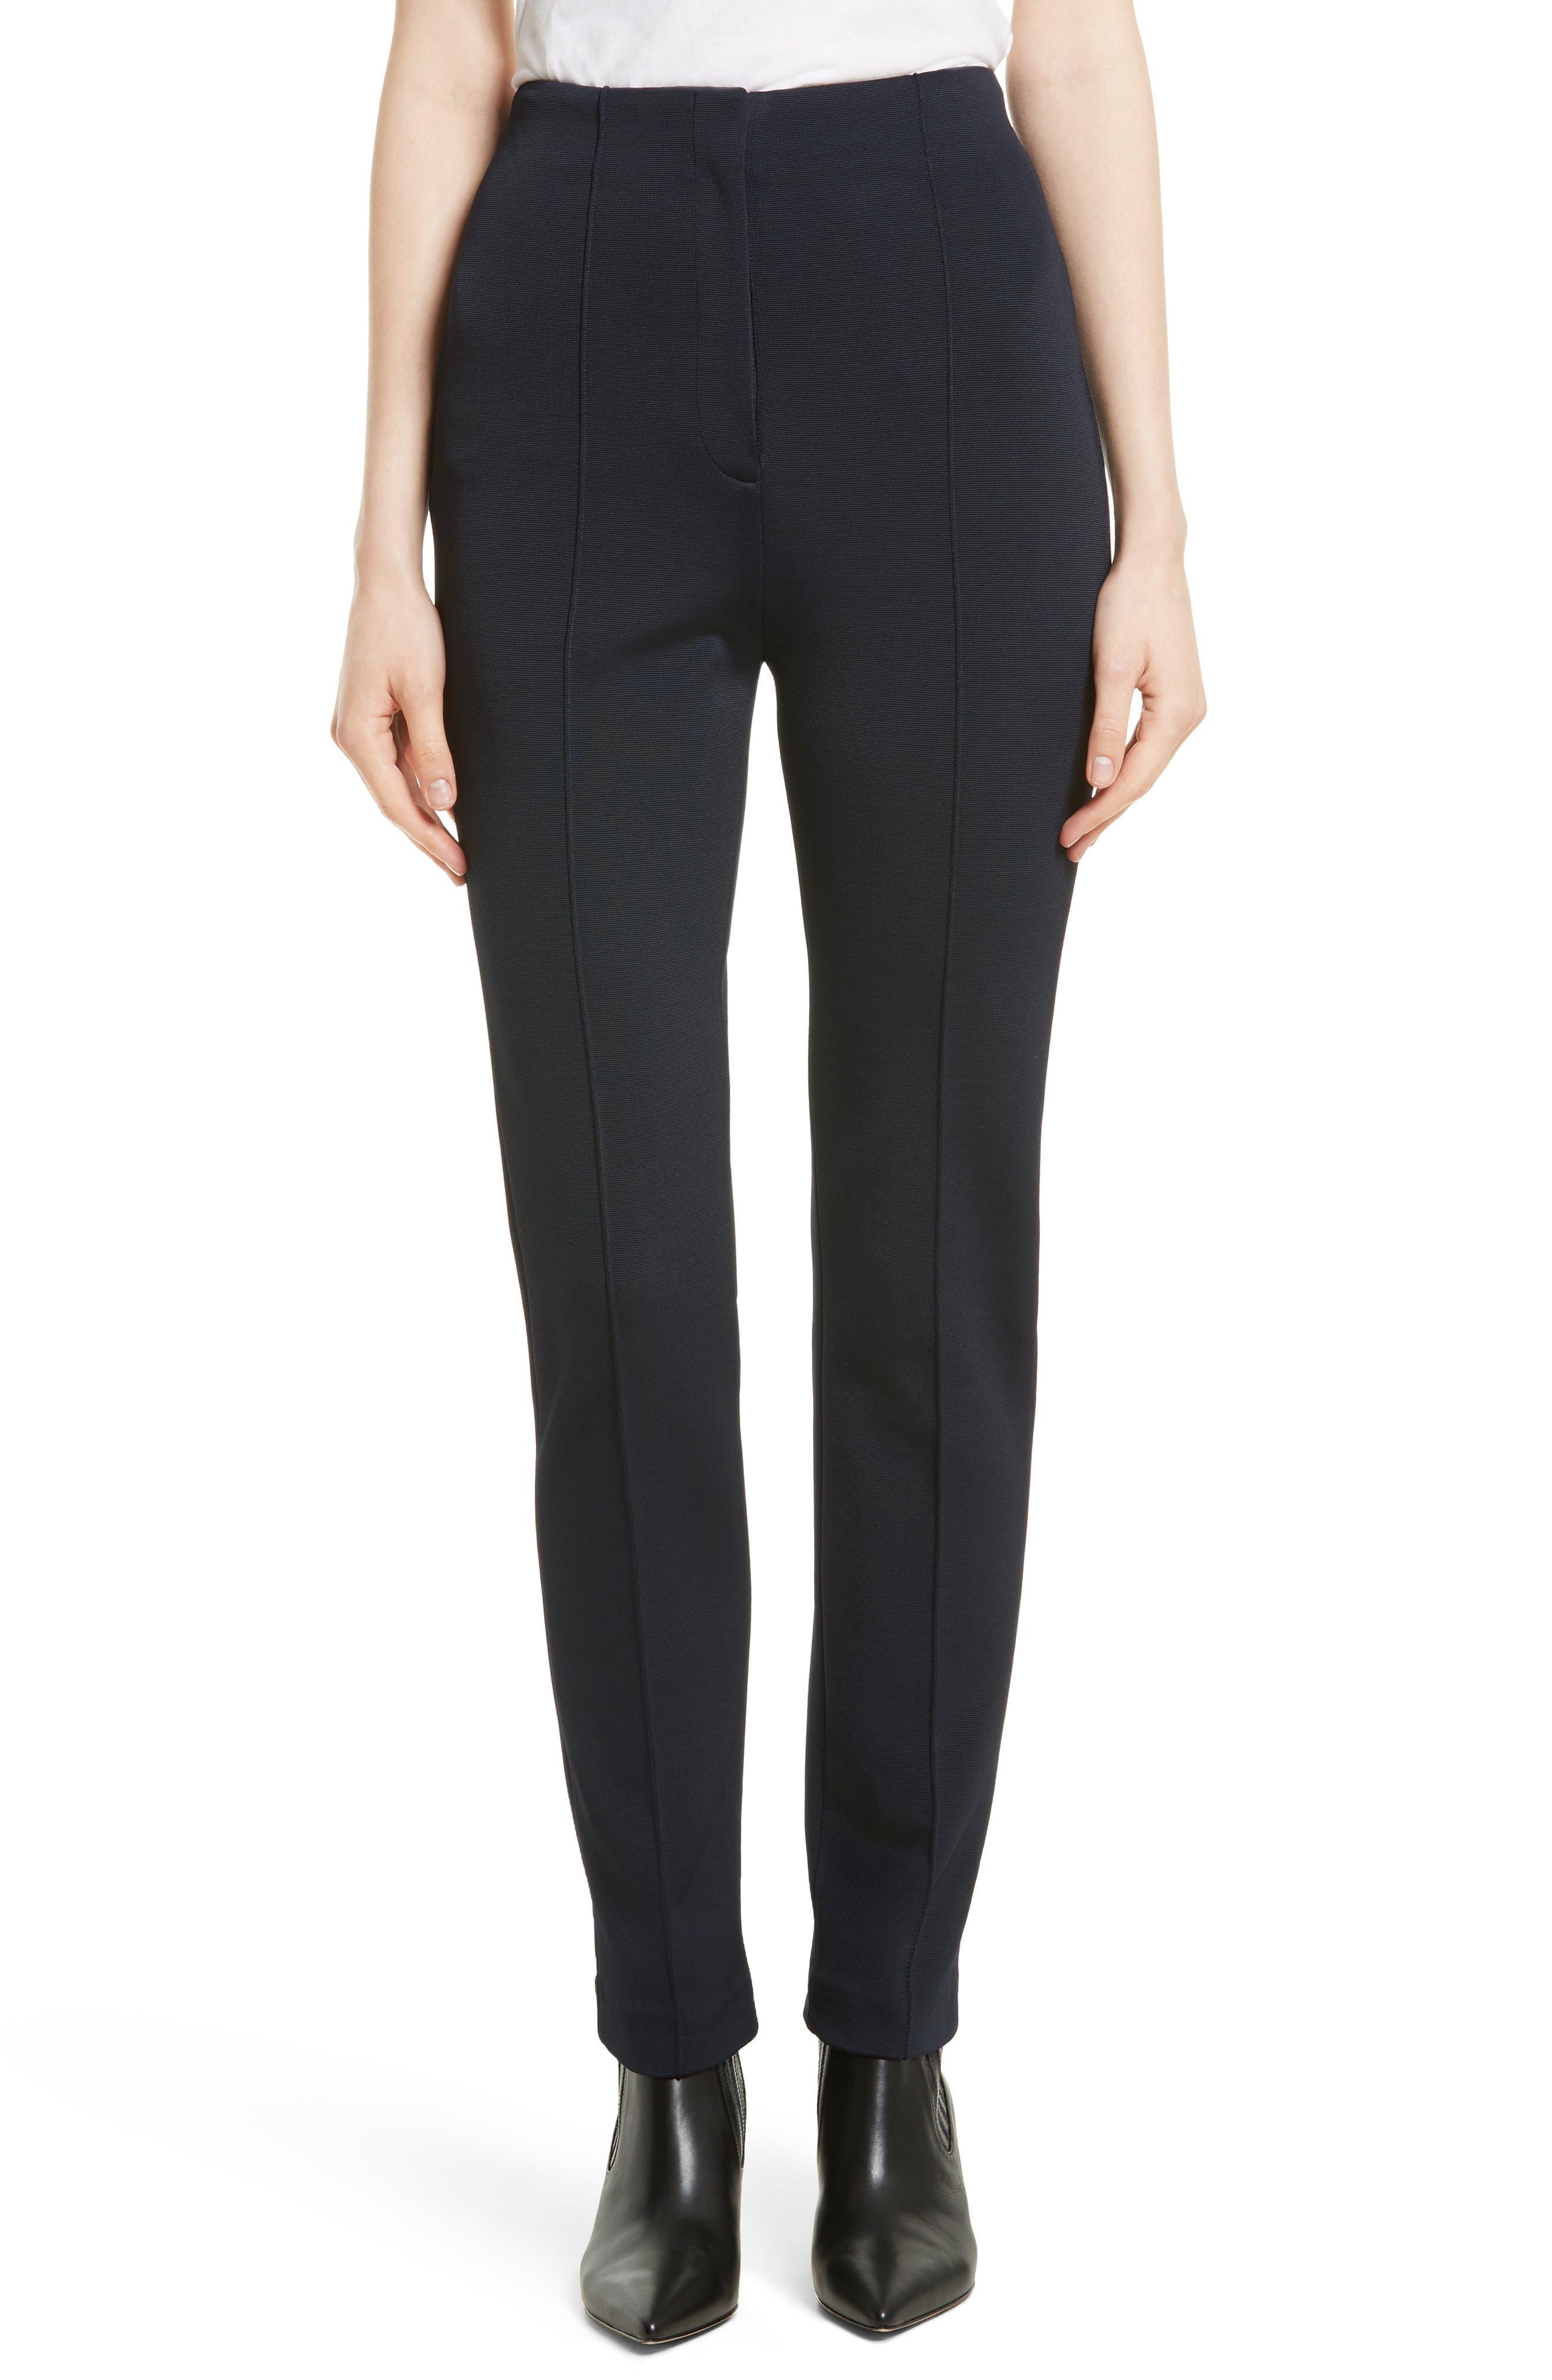 Eileen Fisher High Waist Skinny Pants